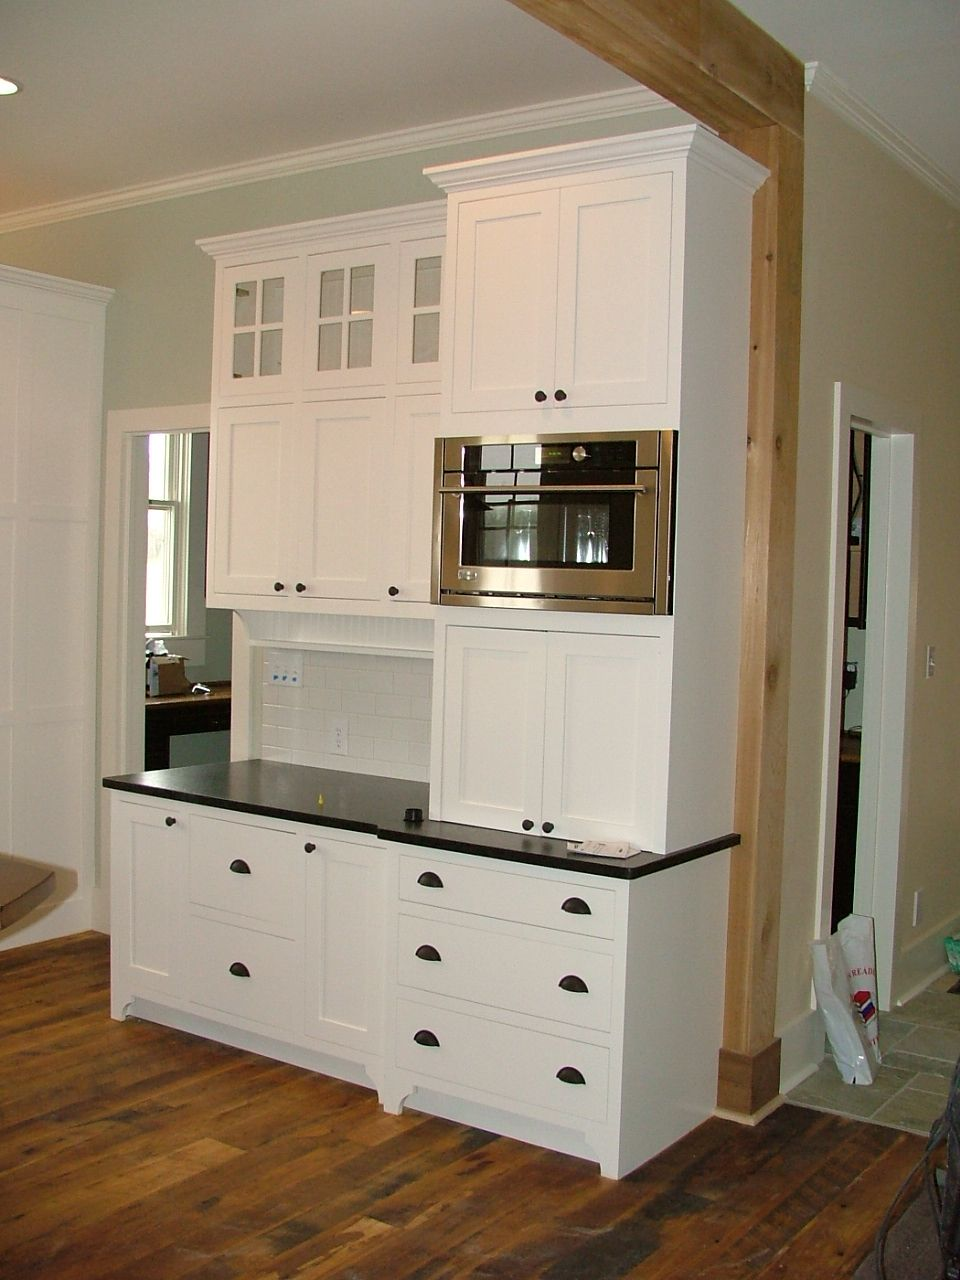 built in microwave kitchen pinterest cbddaaaedb built in microwave kitchen pinterest: corian kitchen top